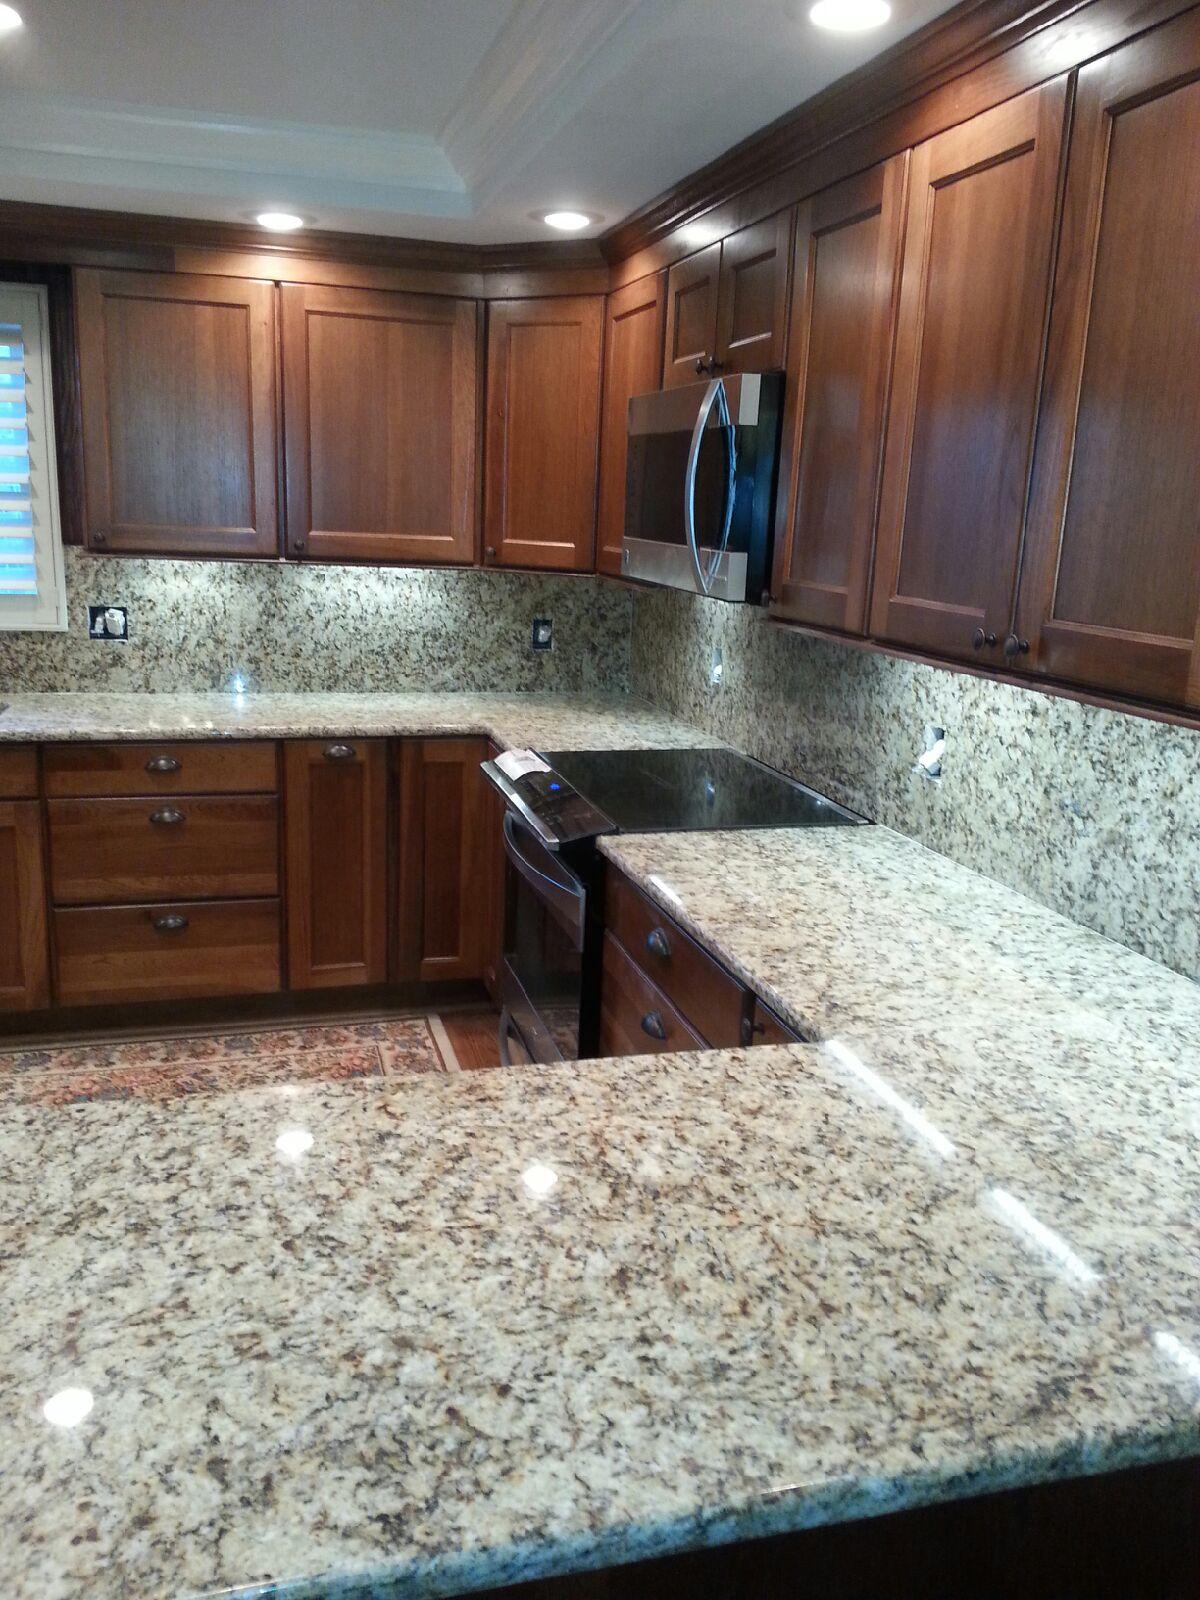 granite top colors  Interior Design Q&A: Choosing the Right Color for Granite ..